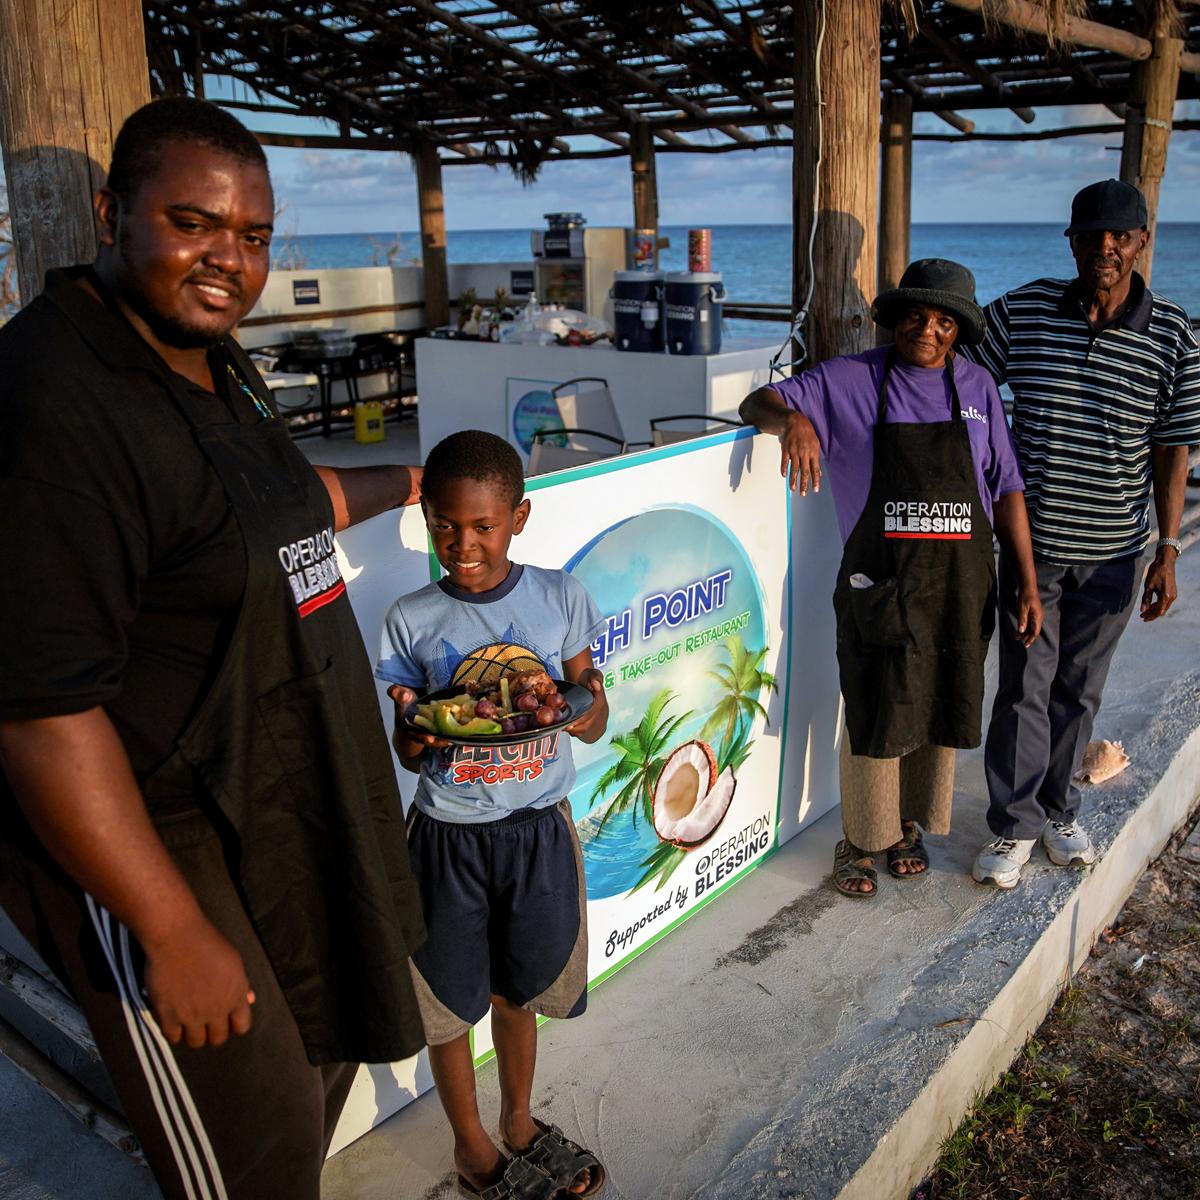 A new business helps rebuild Bahamas after Hurricane Dorian.